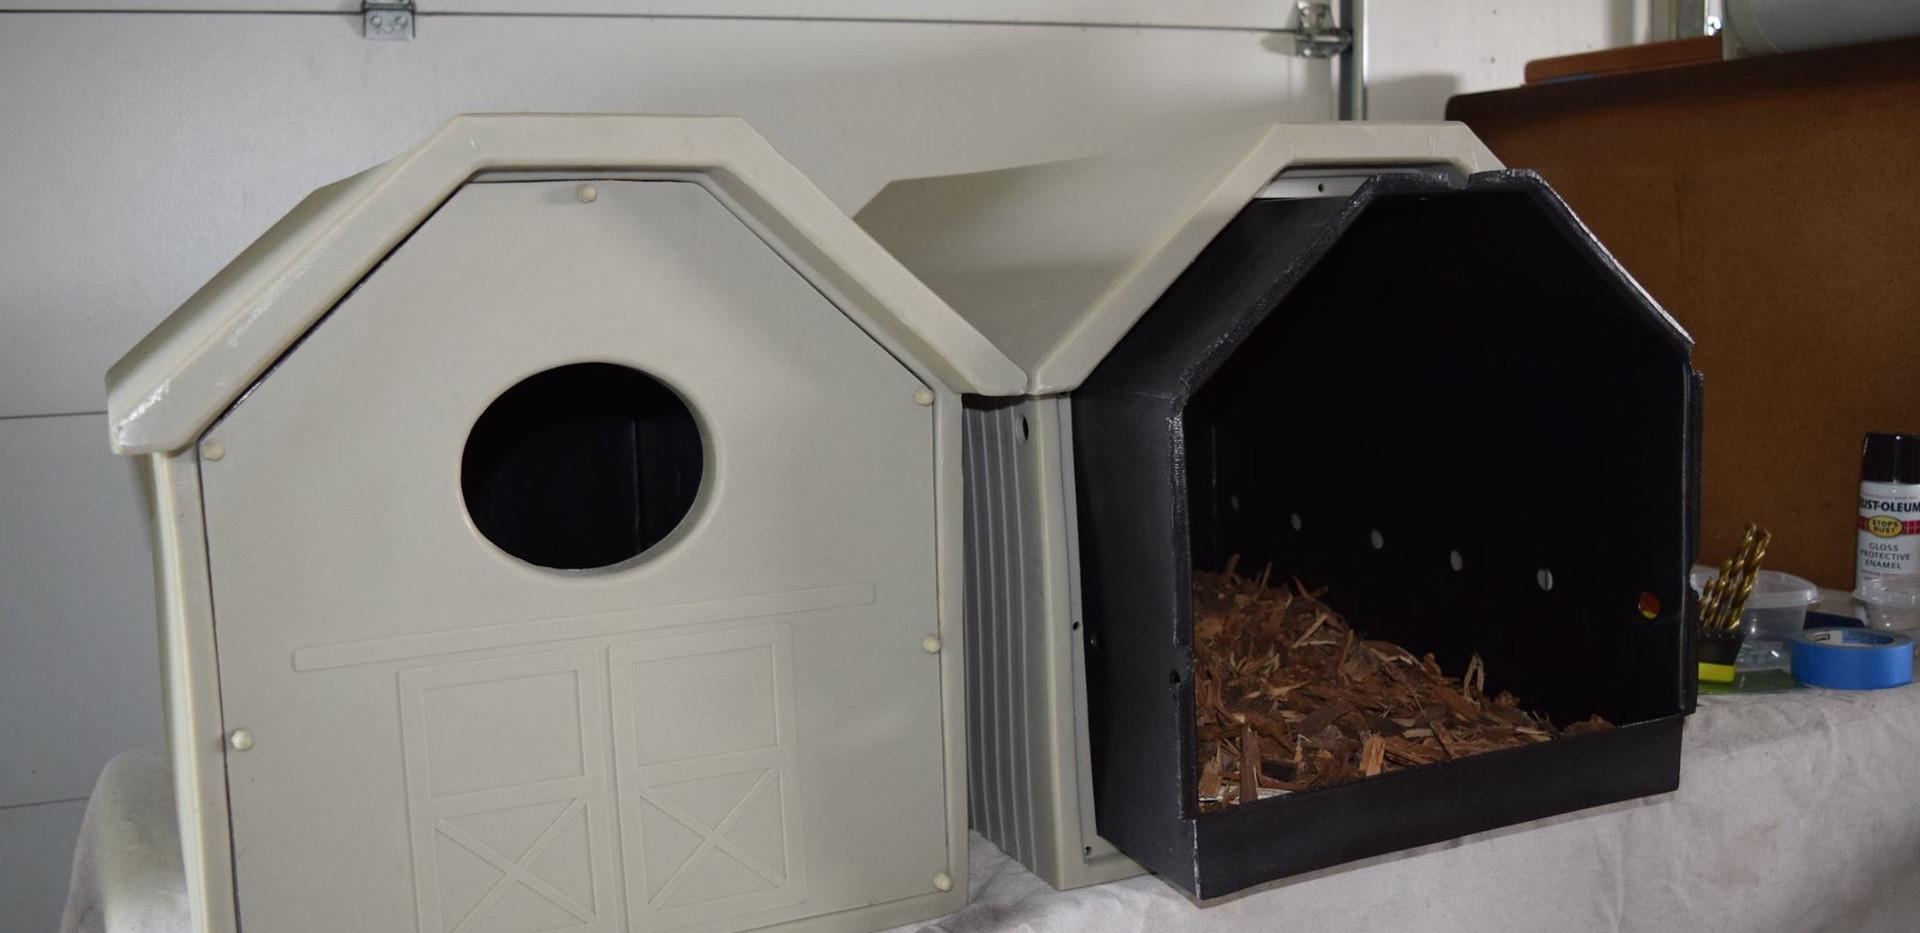 Owl Box displayed